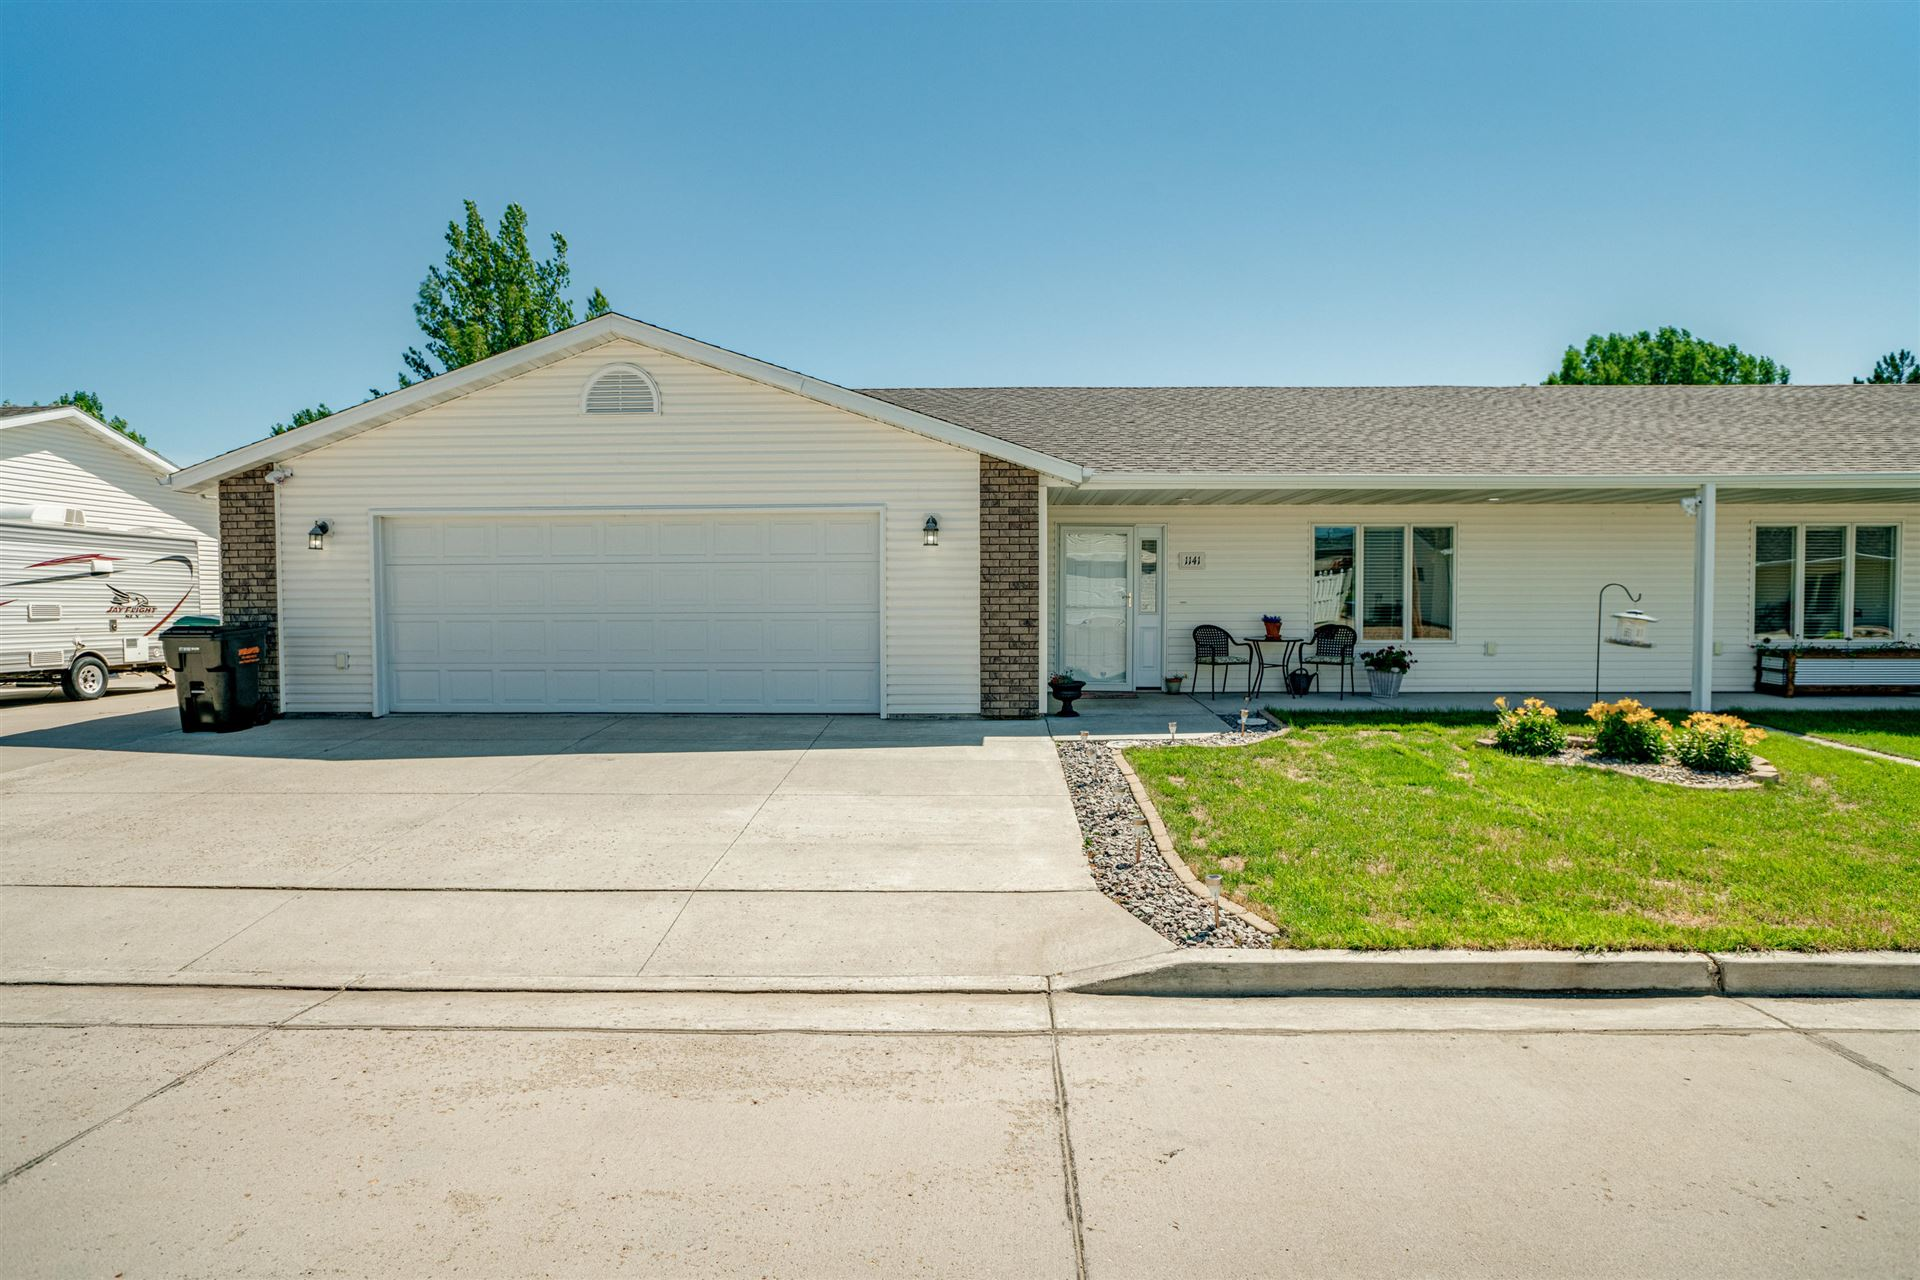 1141 Lakota Lane, Lincoln, ND 58504 - #: 407638